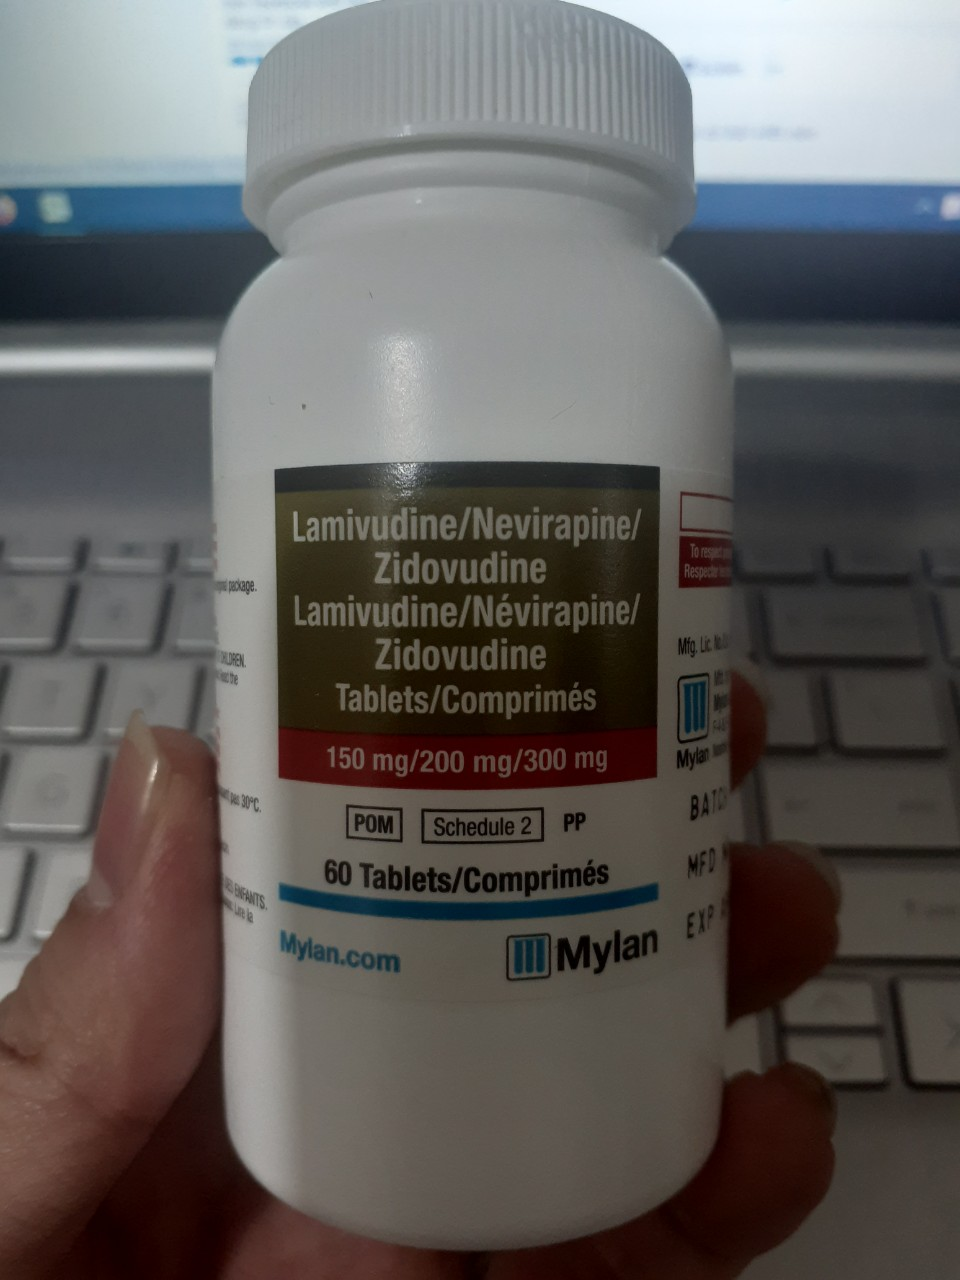 Thuoc-Lamivudine-Nevirapine-Zidovudine-150mg-200mg-300mg